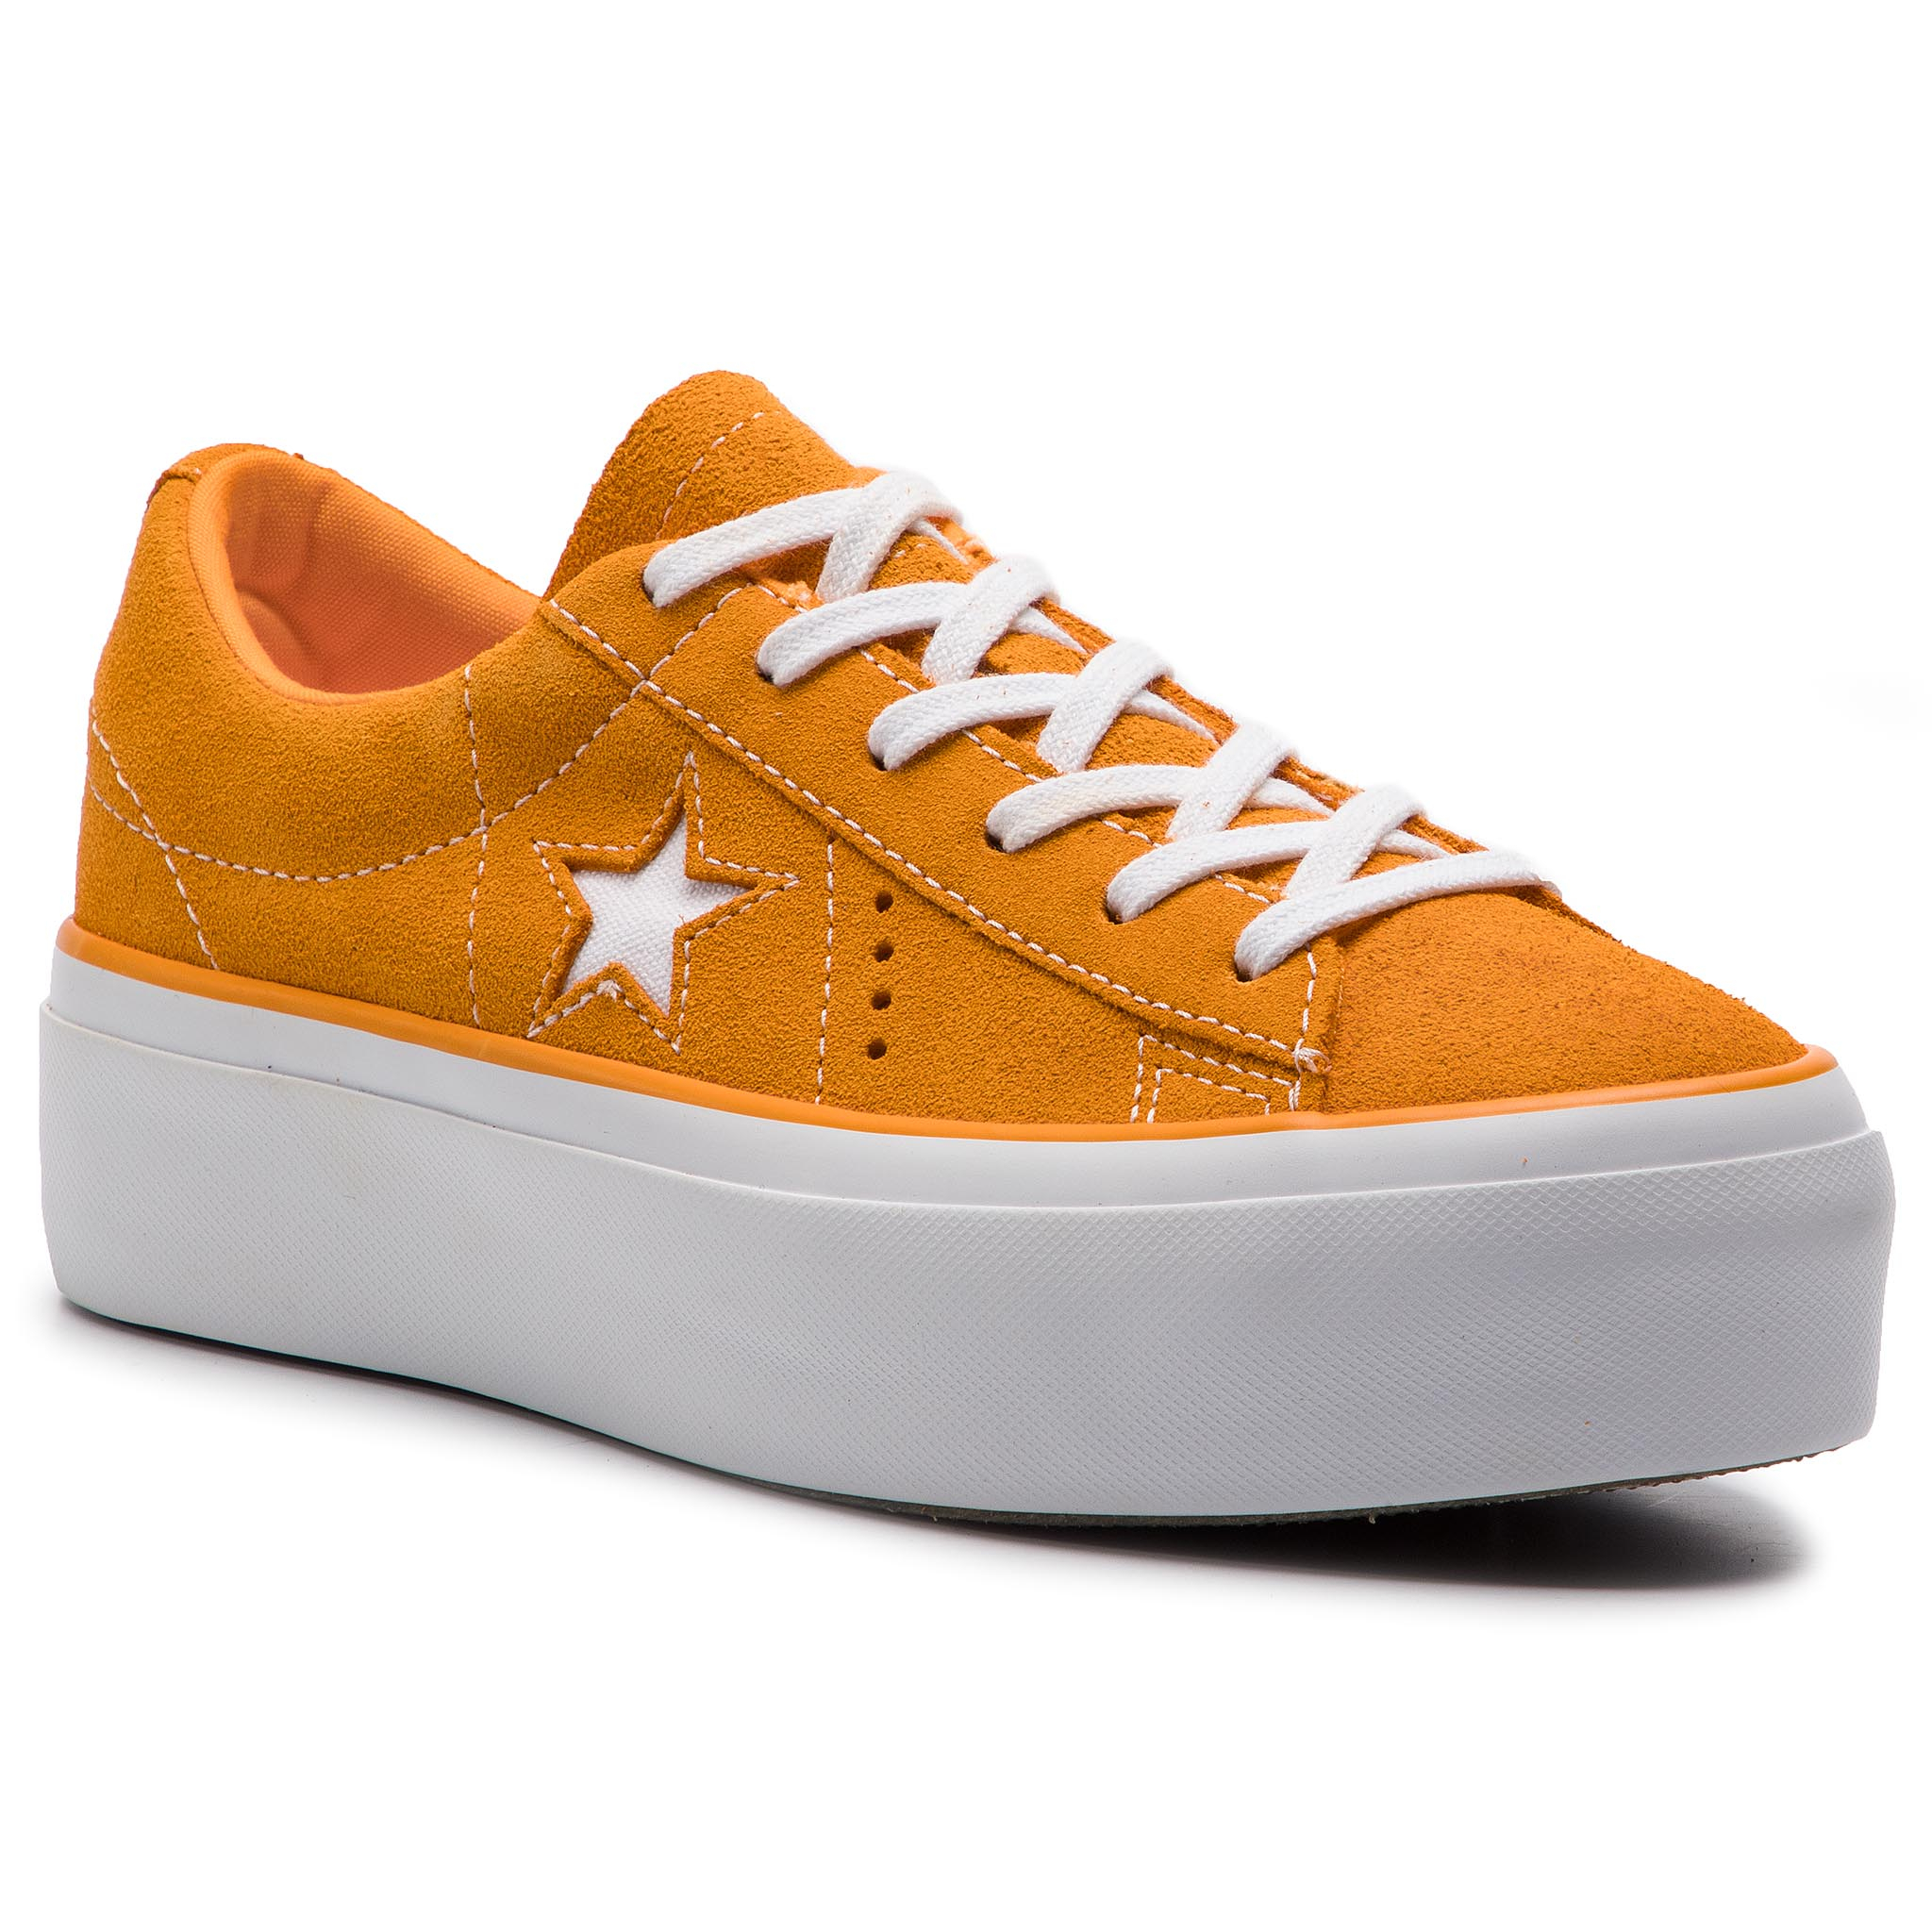 Tenisky CONVERSE - One Star Platform Ox 563487C Field Orange White ... 8f8aed7900f